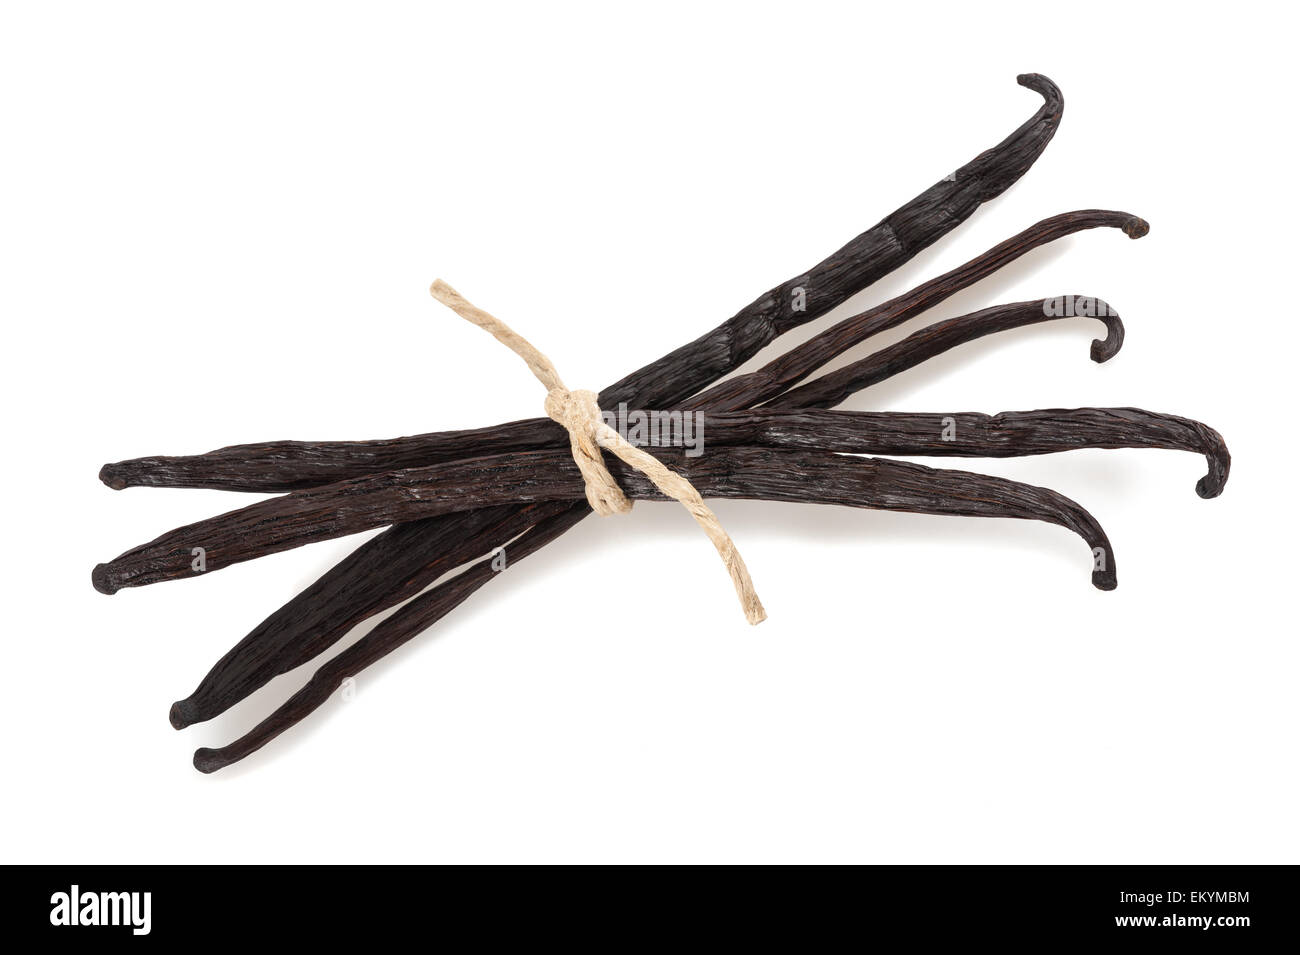 tied vanilla sticks isolated  on white background - Stock Image